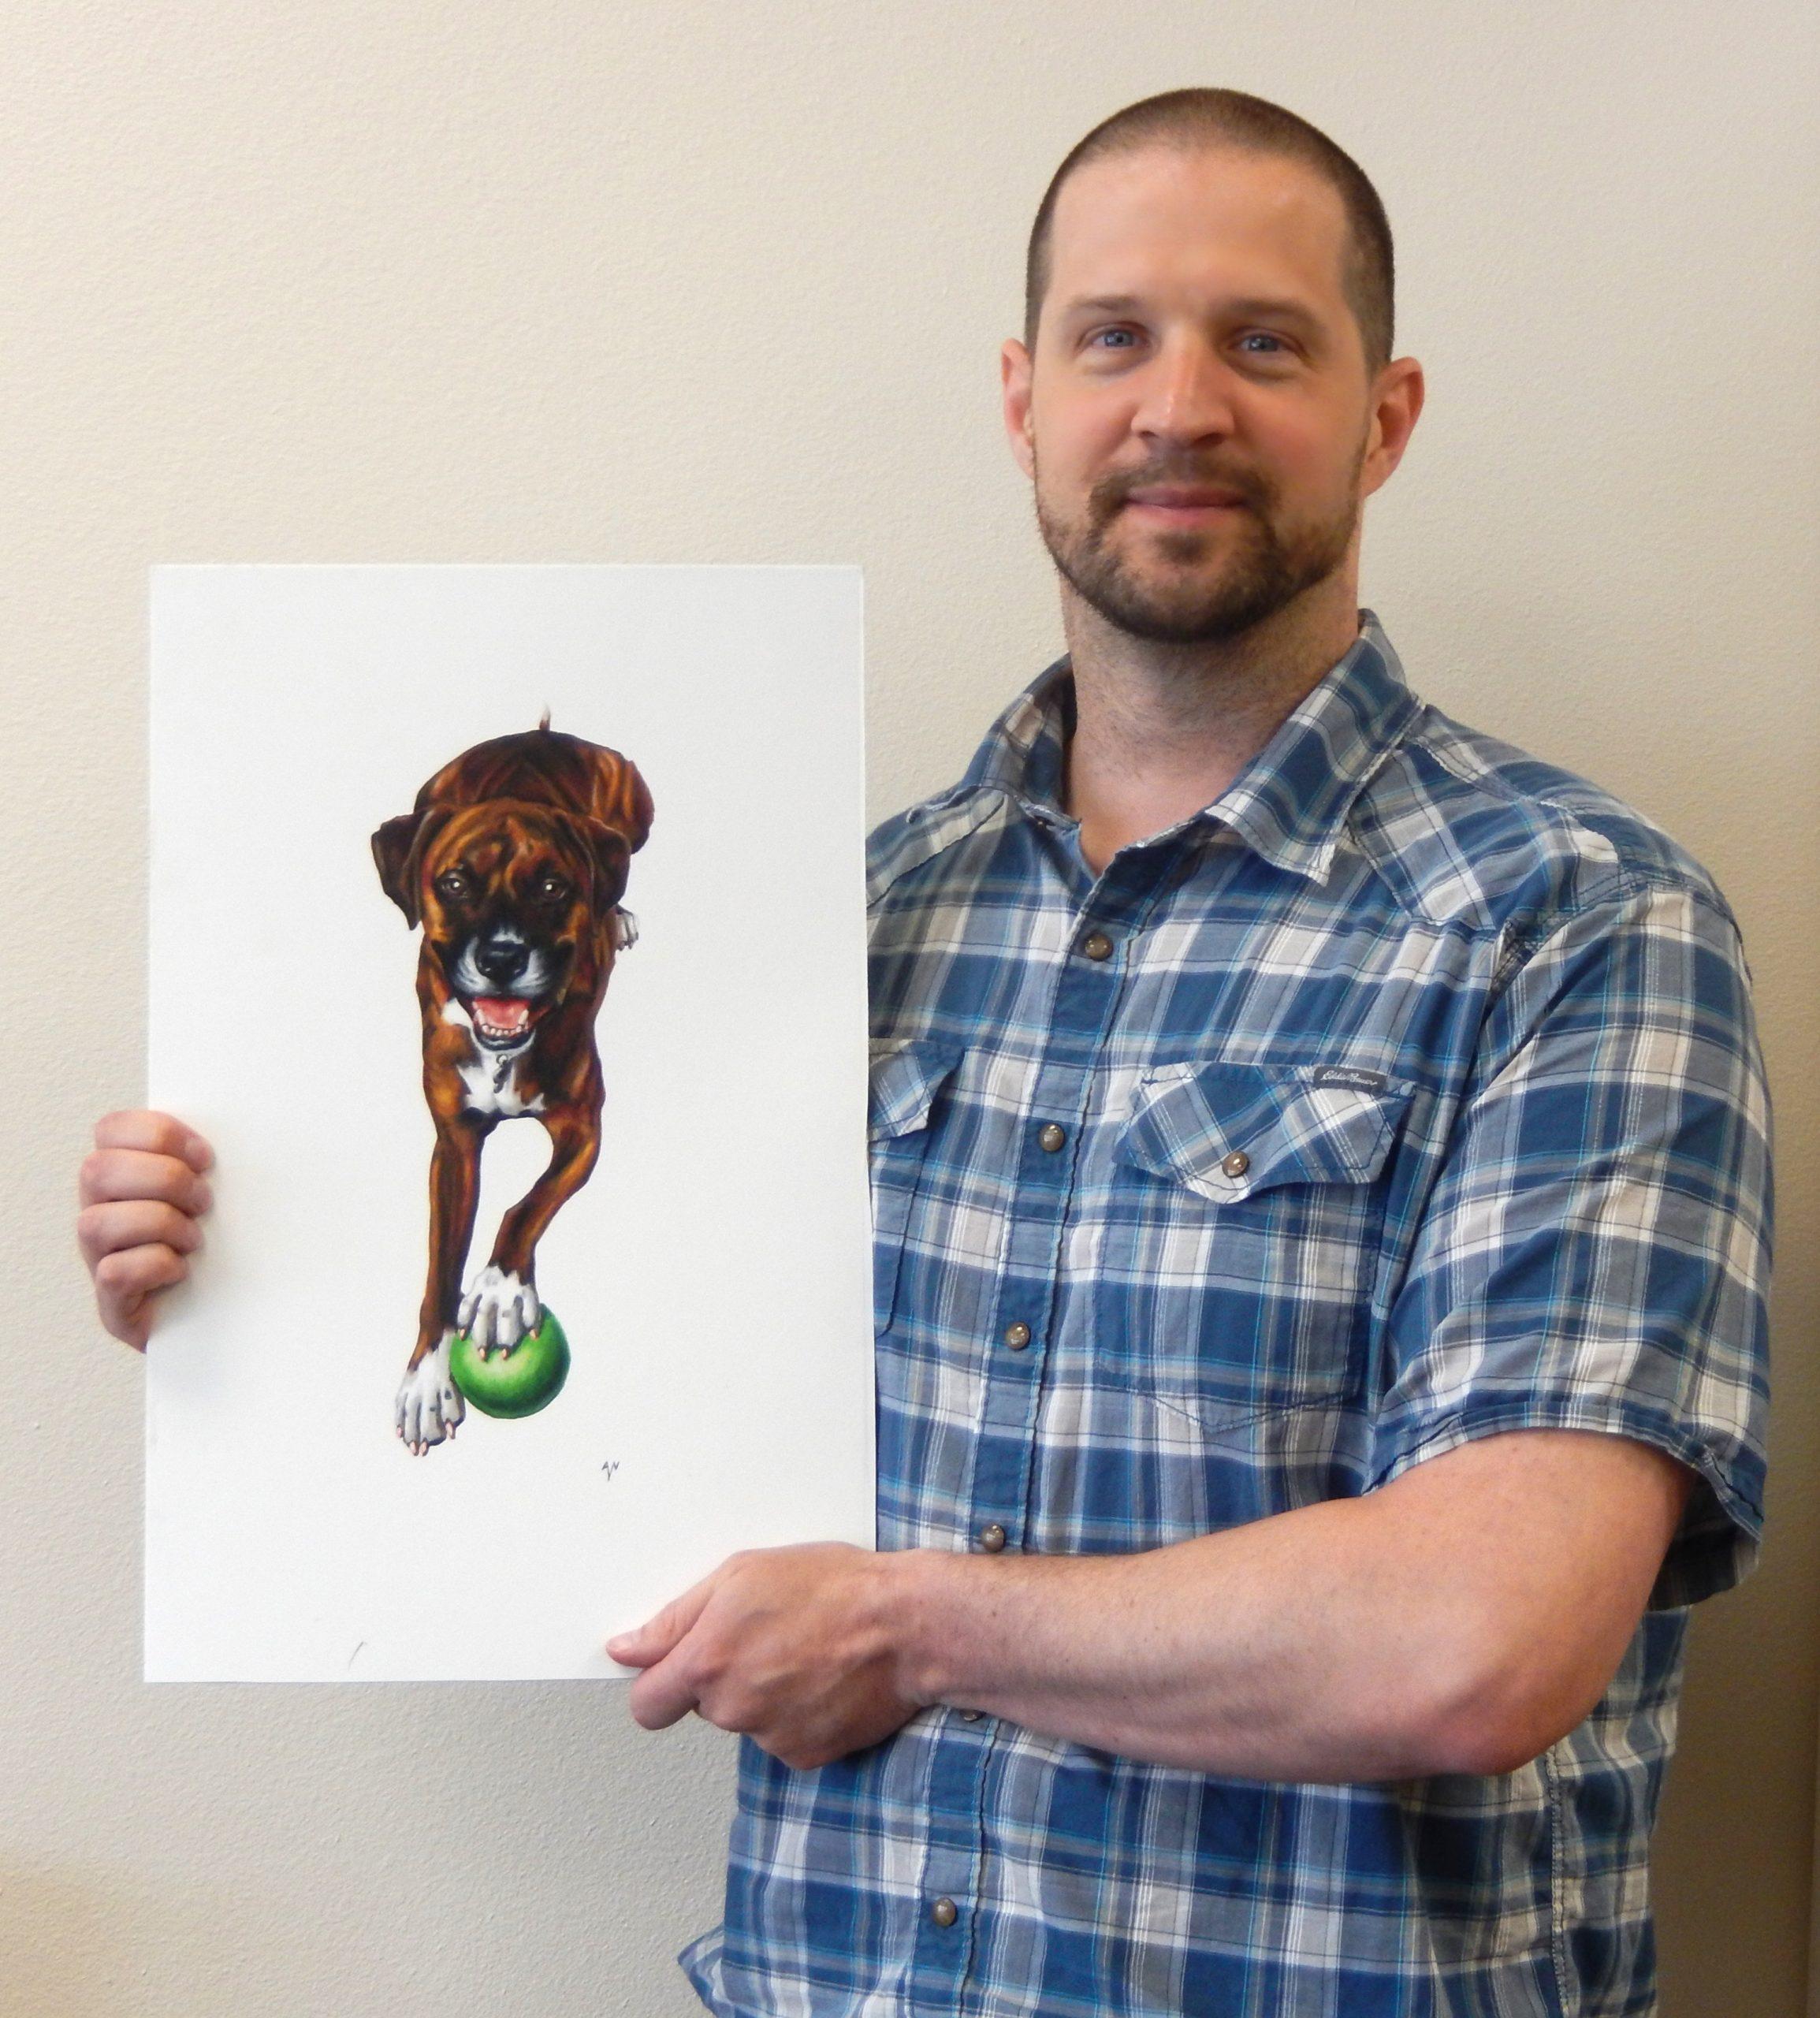 Custom Dog Illustration created in Colored Pencils